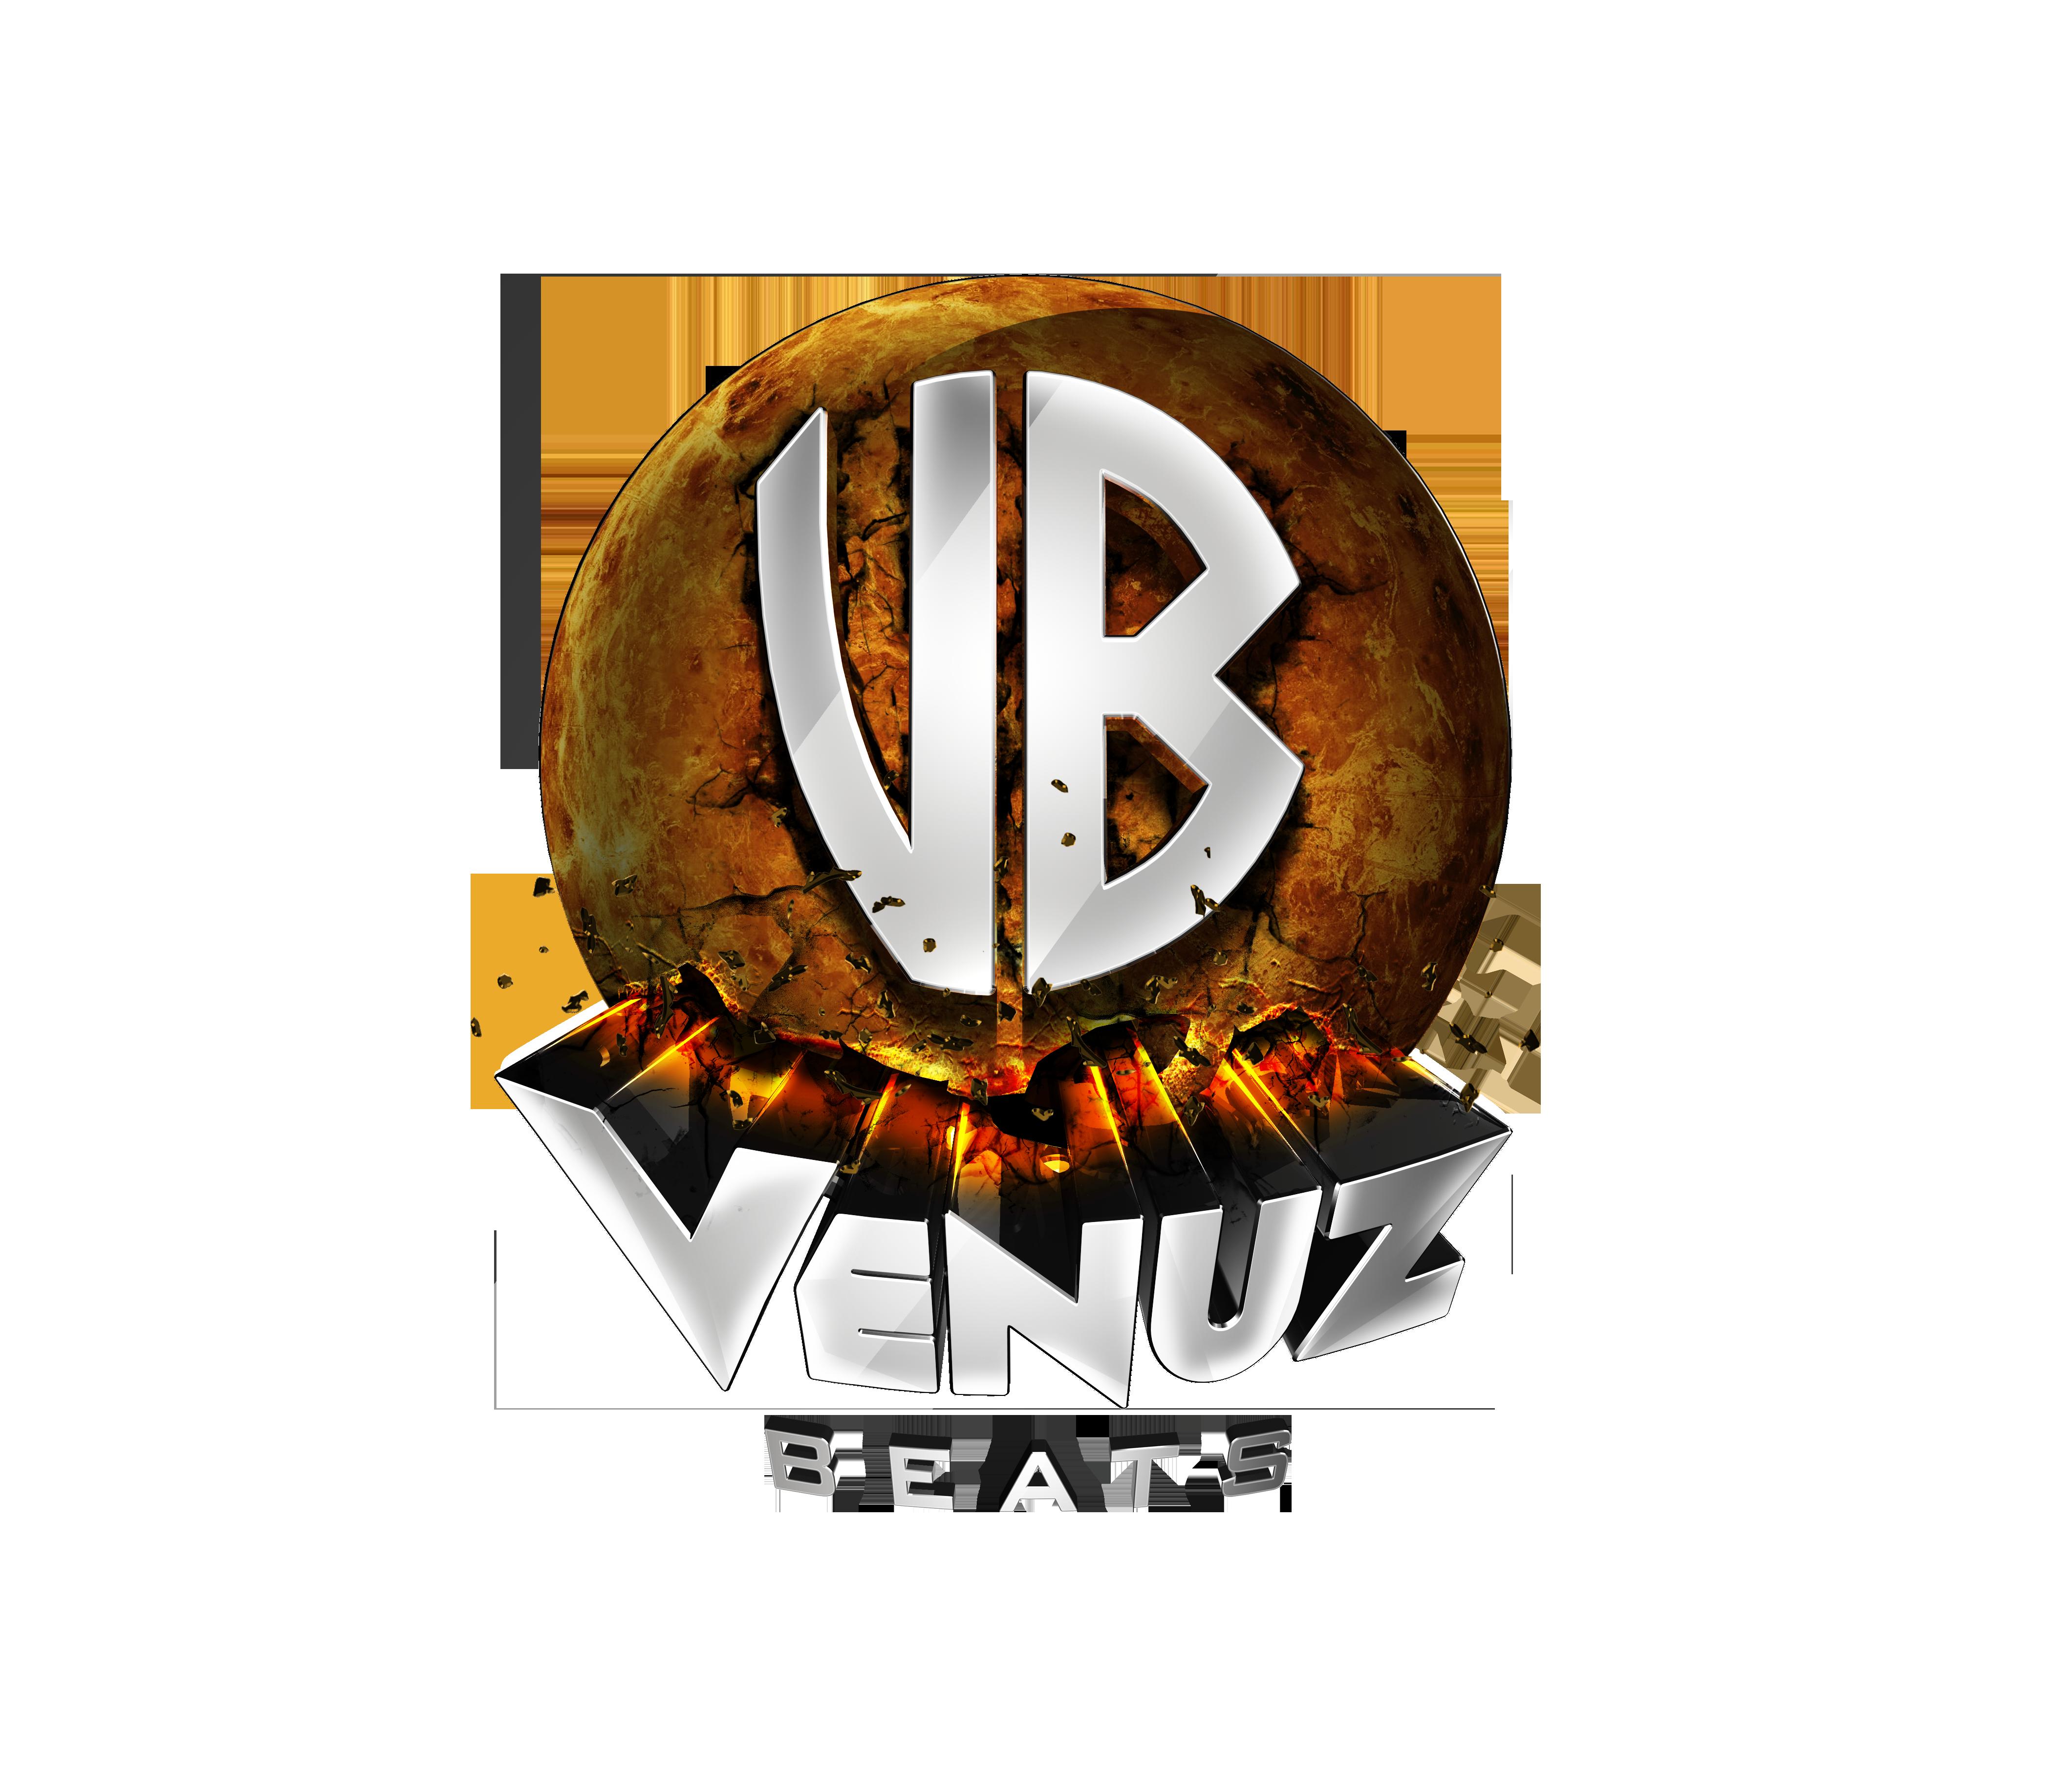 Venuz Beats - Neo Soul Beats